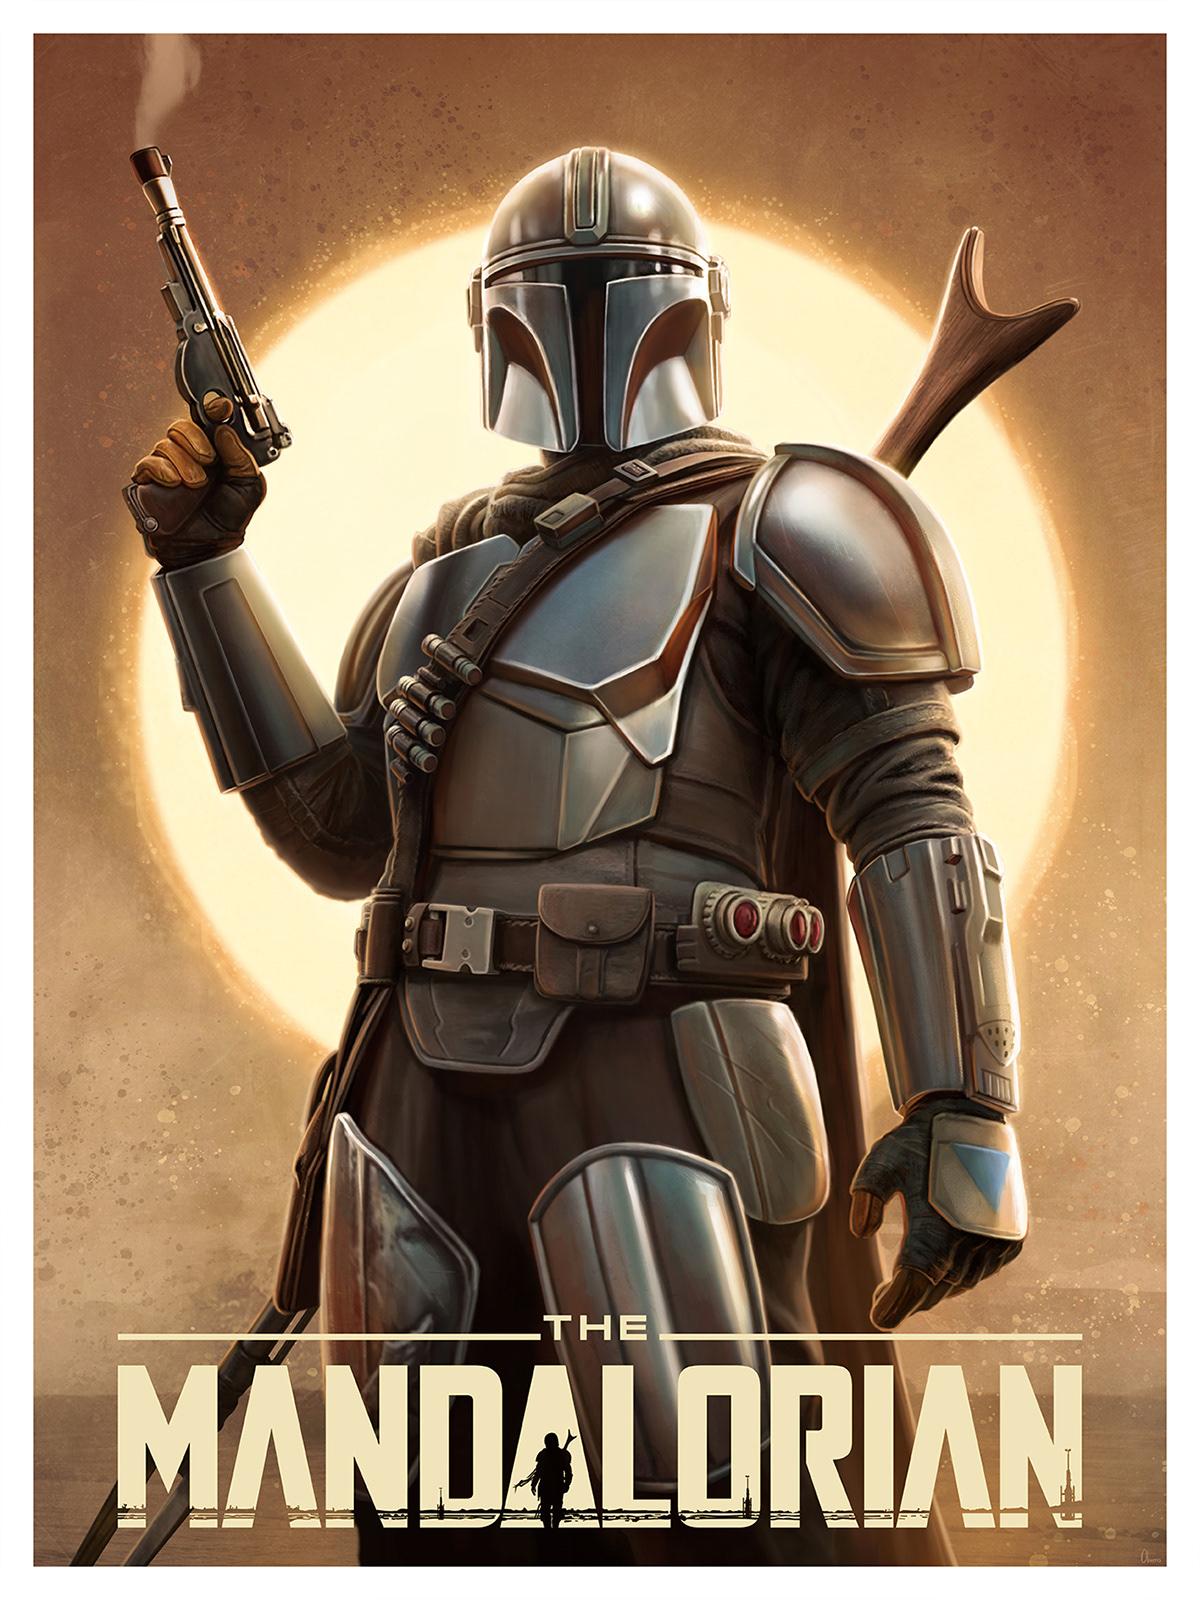 The Mandalorien